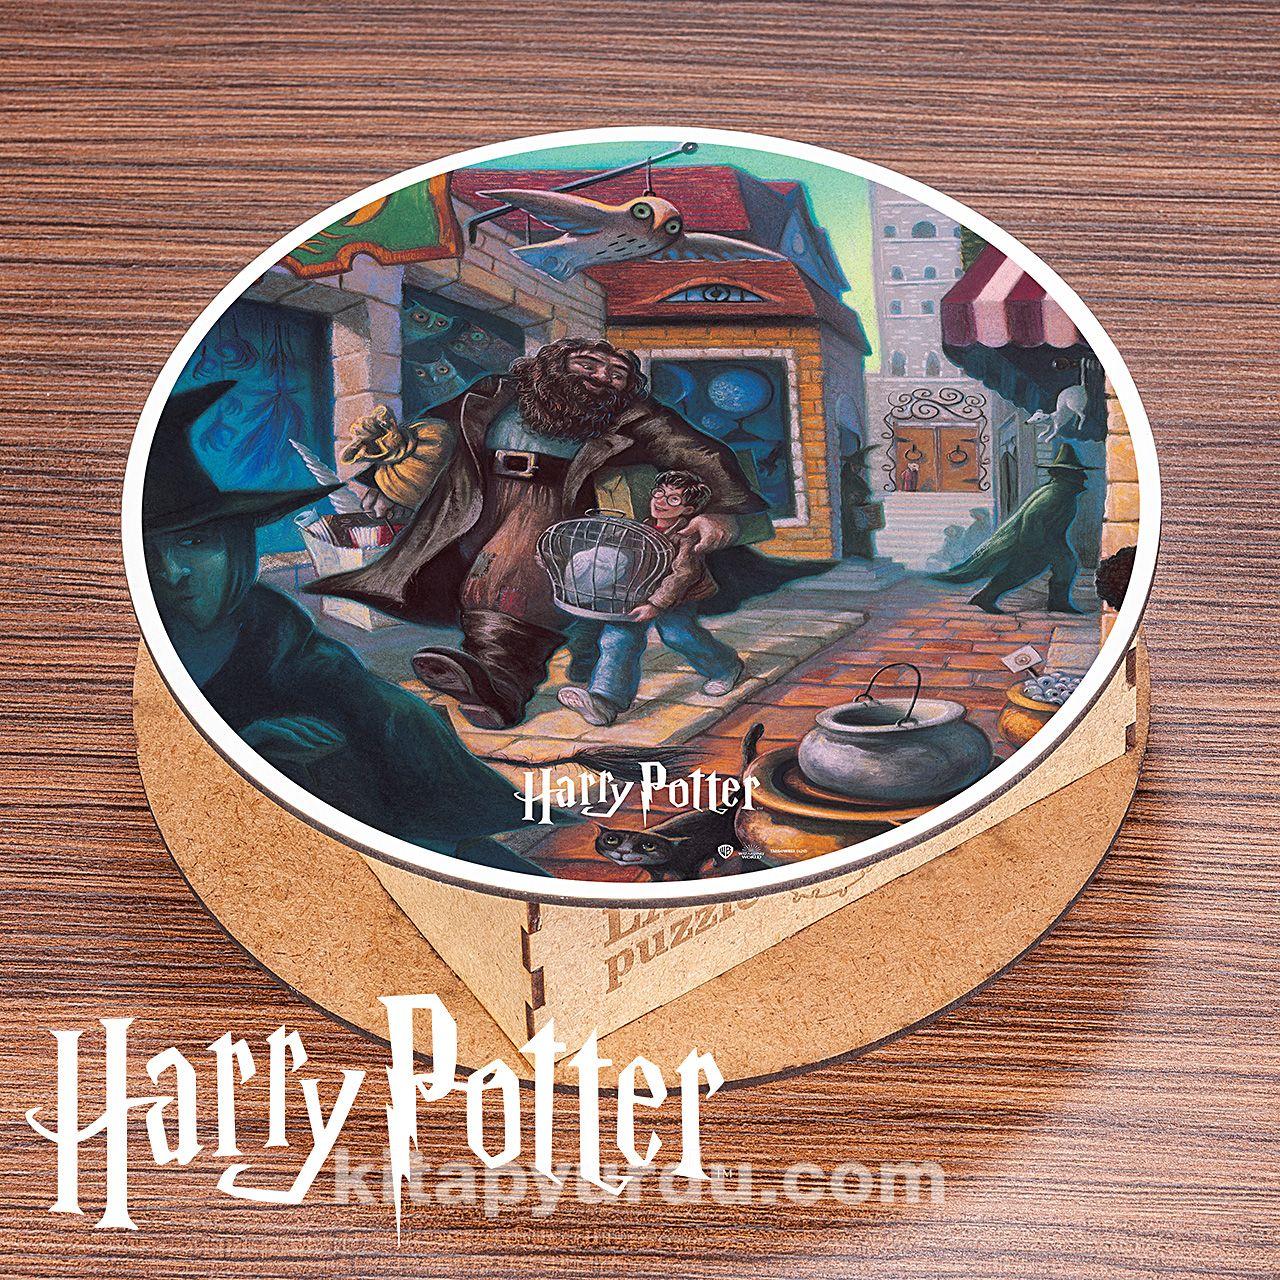 Harry Potter - Diagon Alley Ahşap Lava Puzzle 300 Parça (KOP-HP262 - CCC) (Lisanslı Ürünler) PDF Kitap İndir